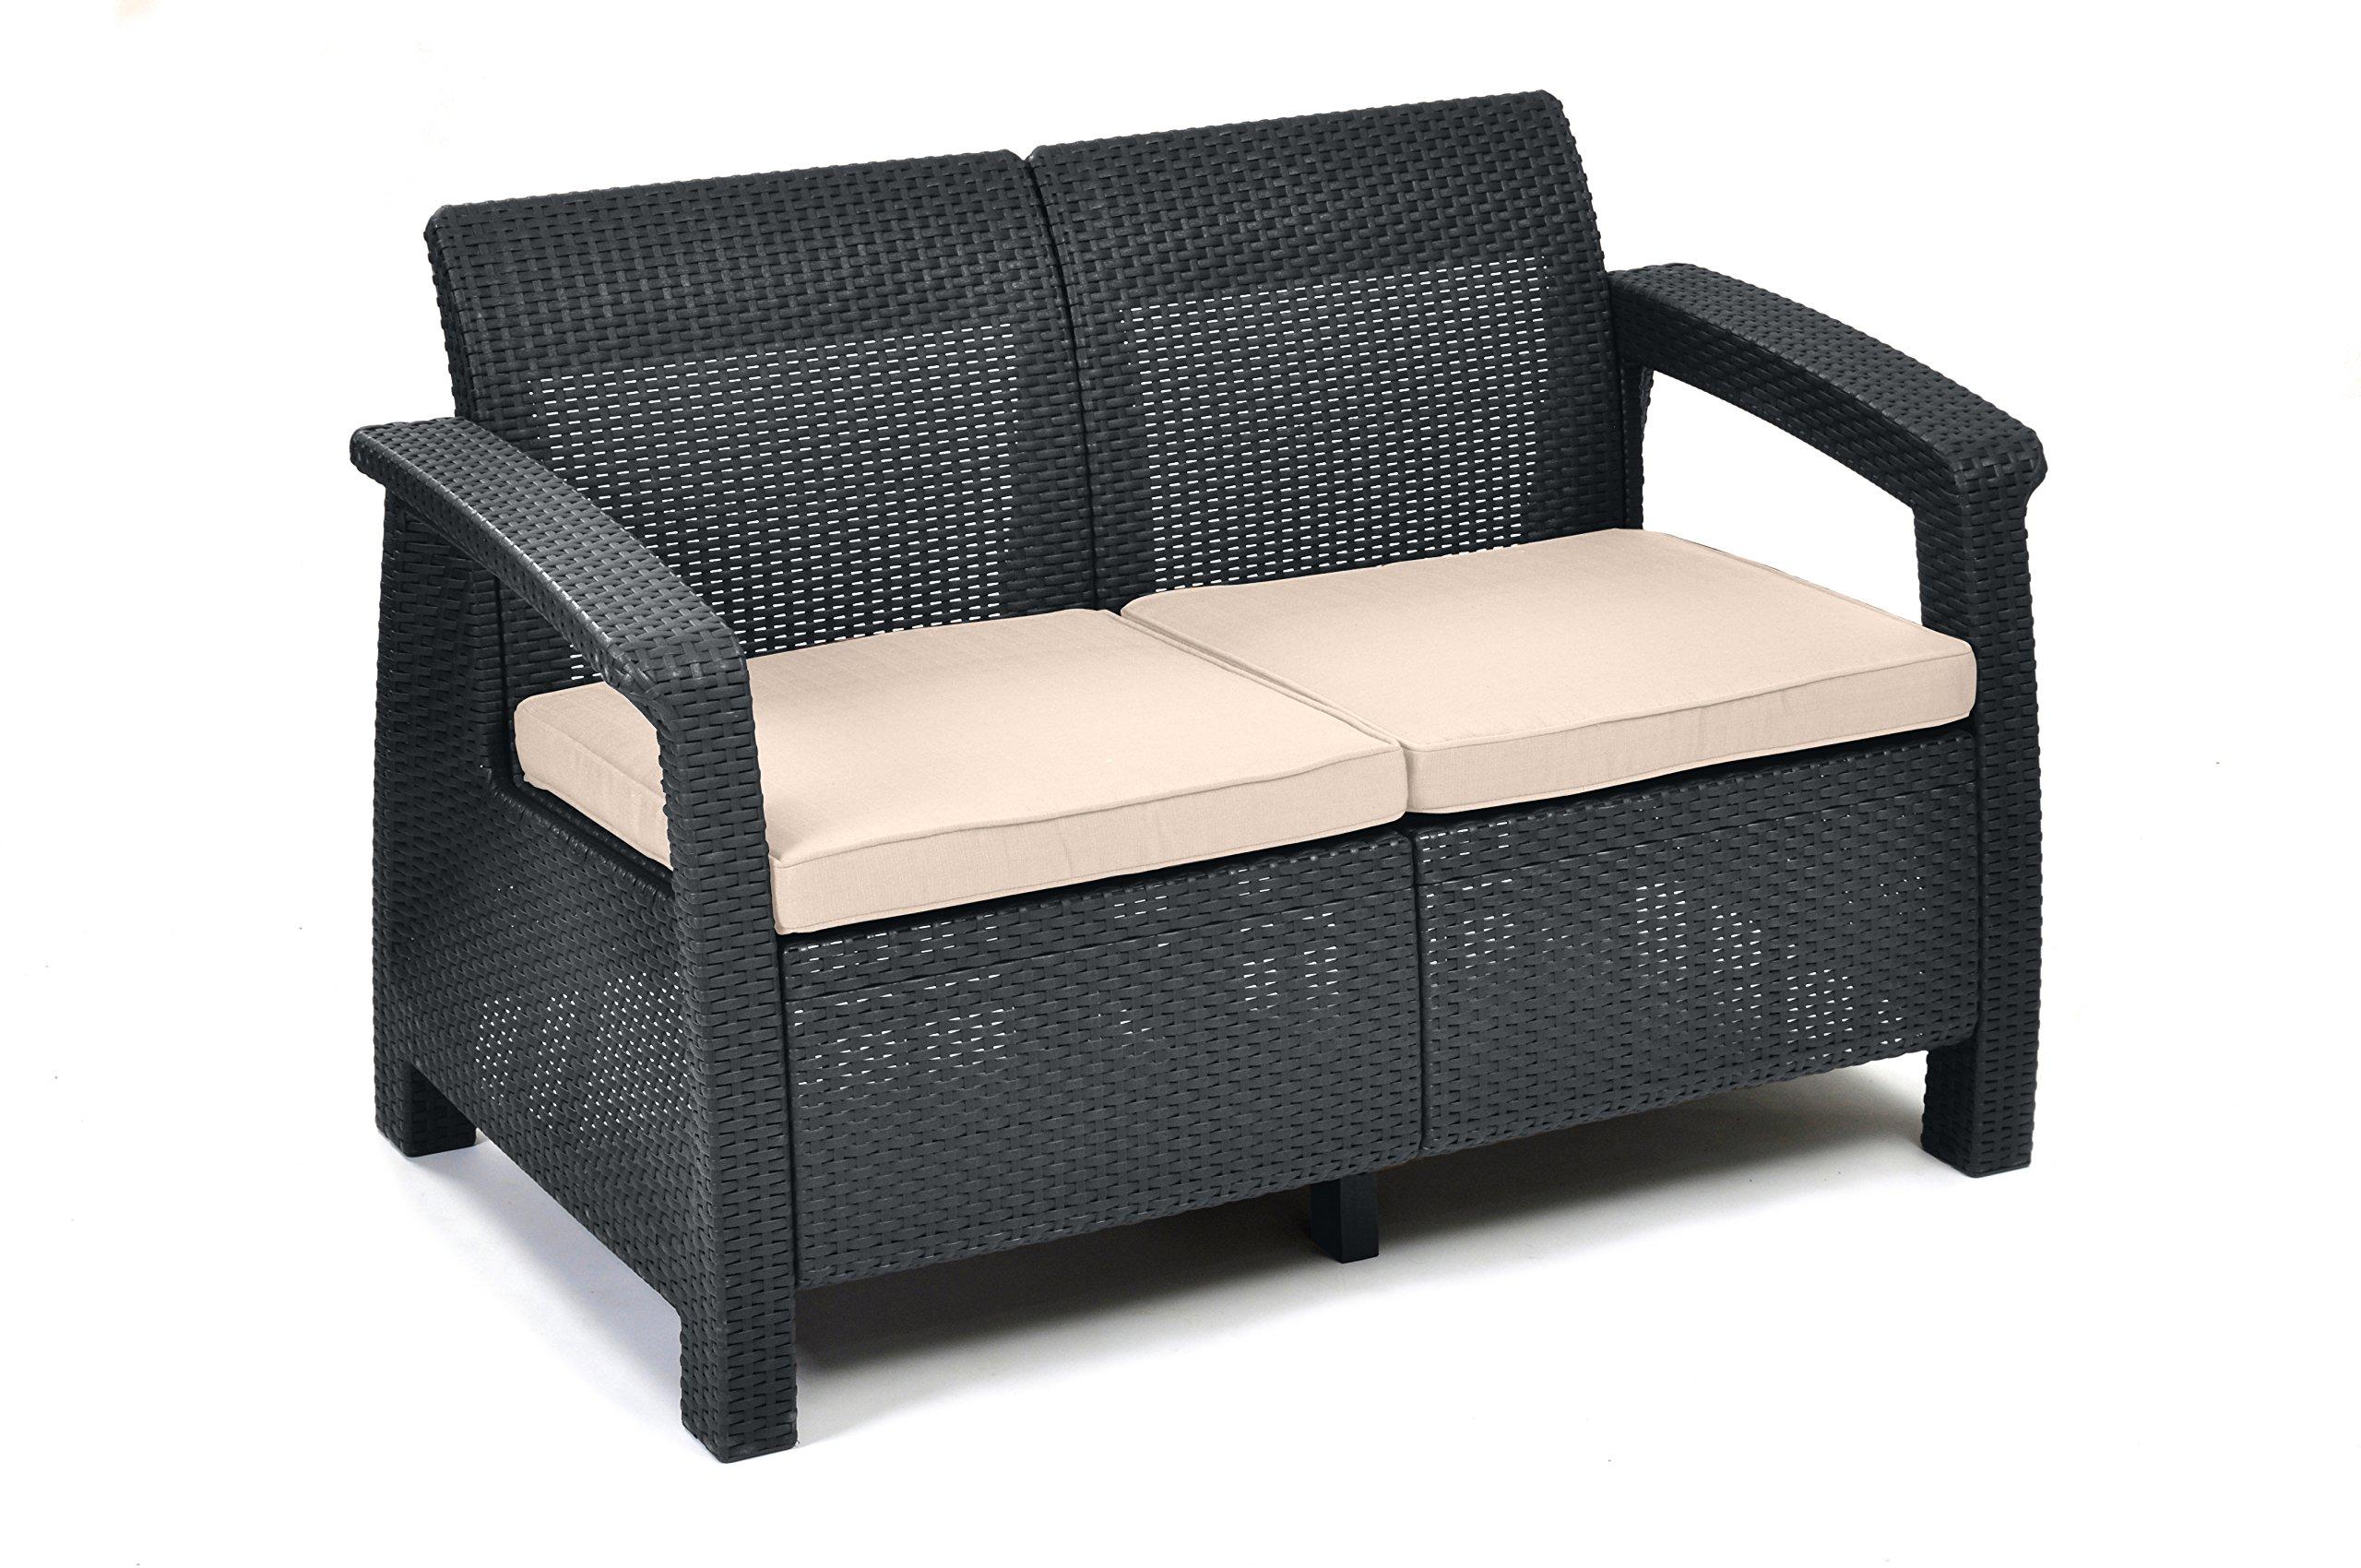 Rattan sofa outdoor  Keter Korfu 2 Sitzer Rattan Sofa Outdoor Gartenmöbel Graphit mit ...